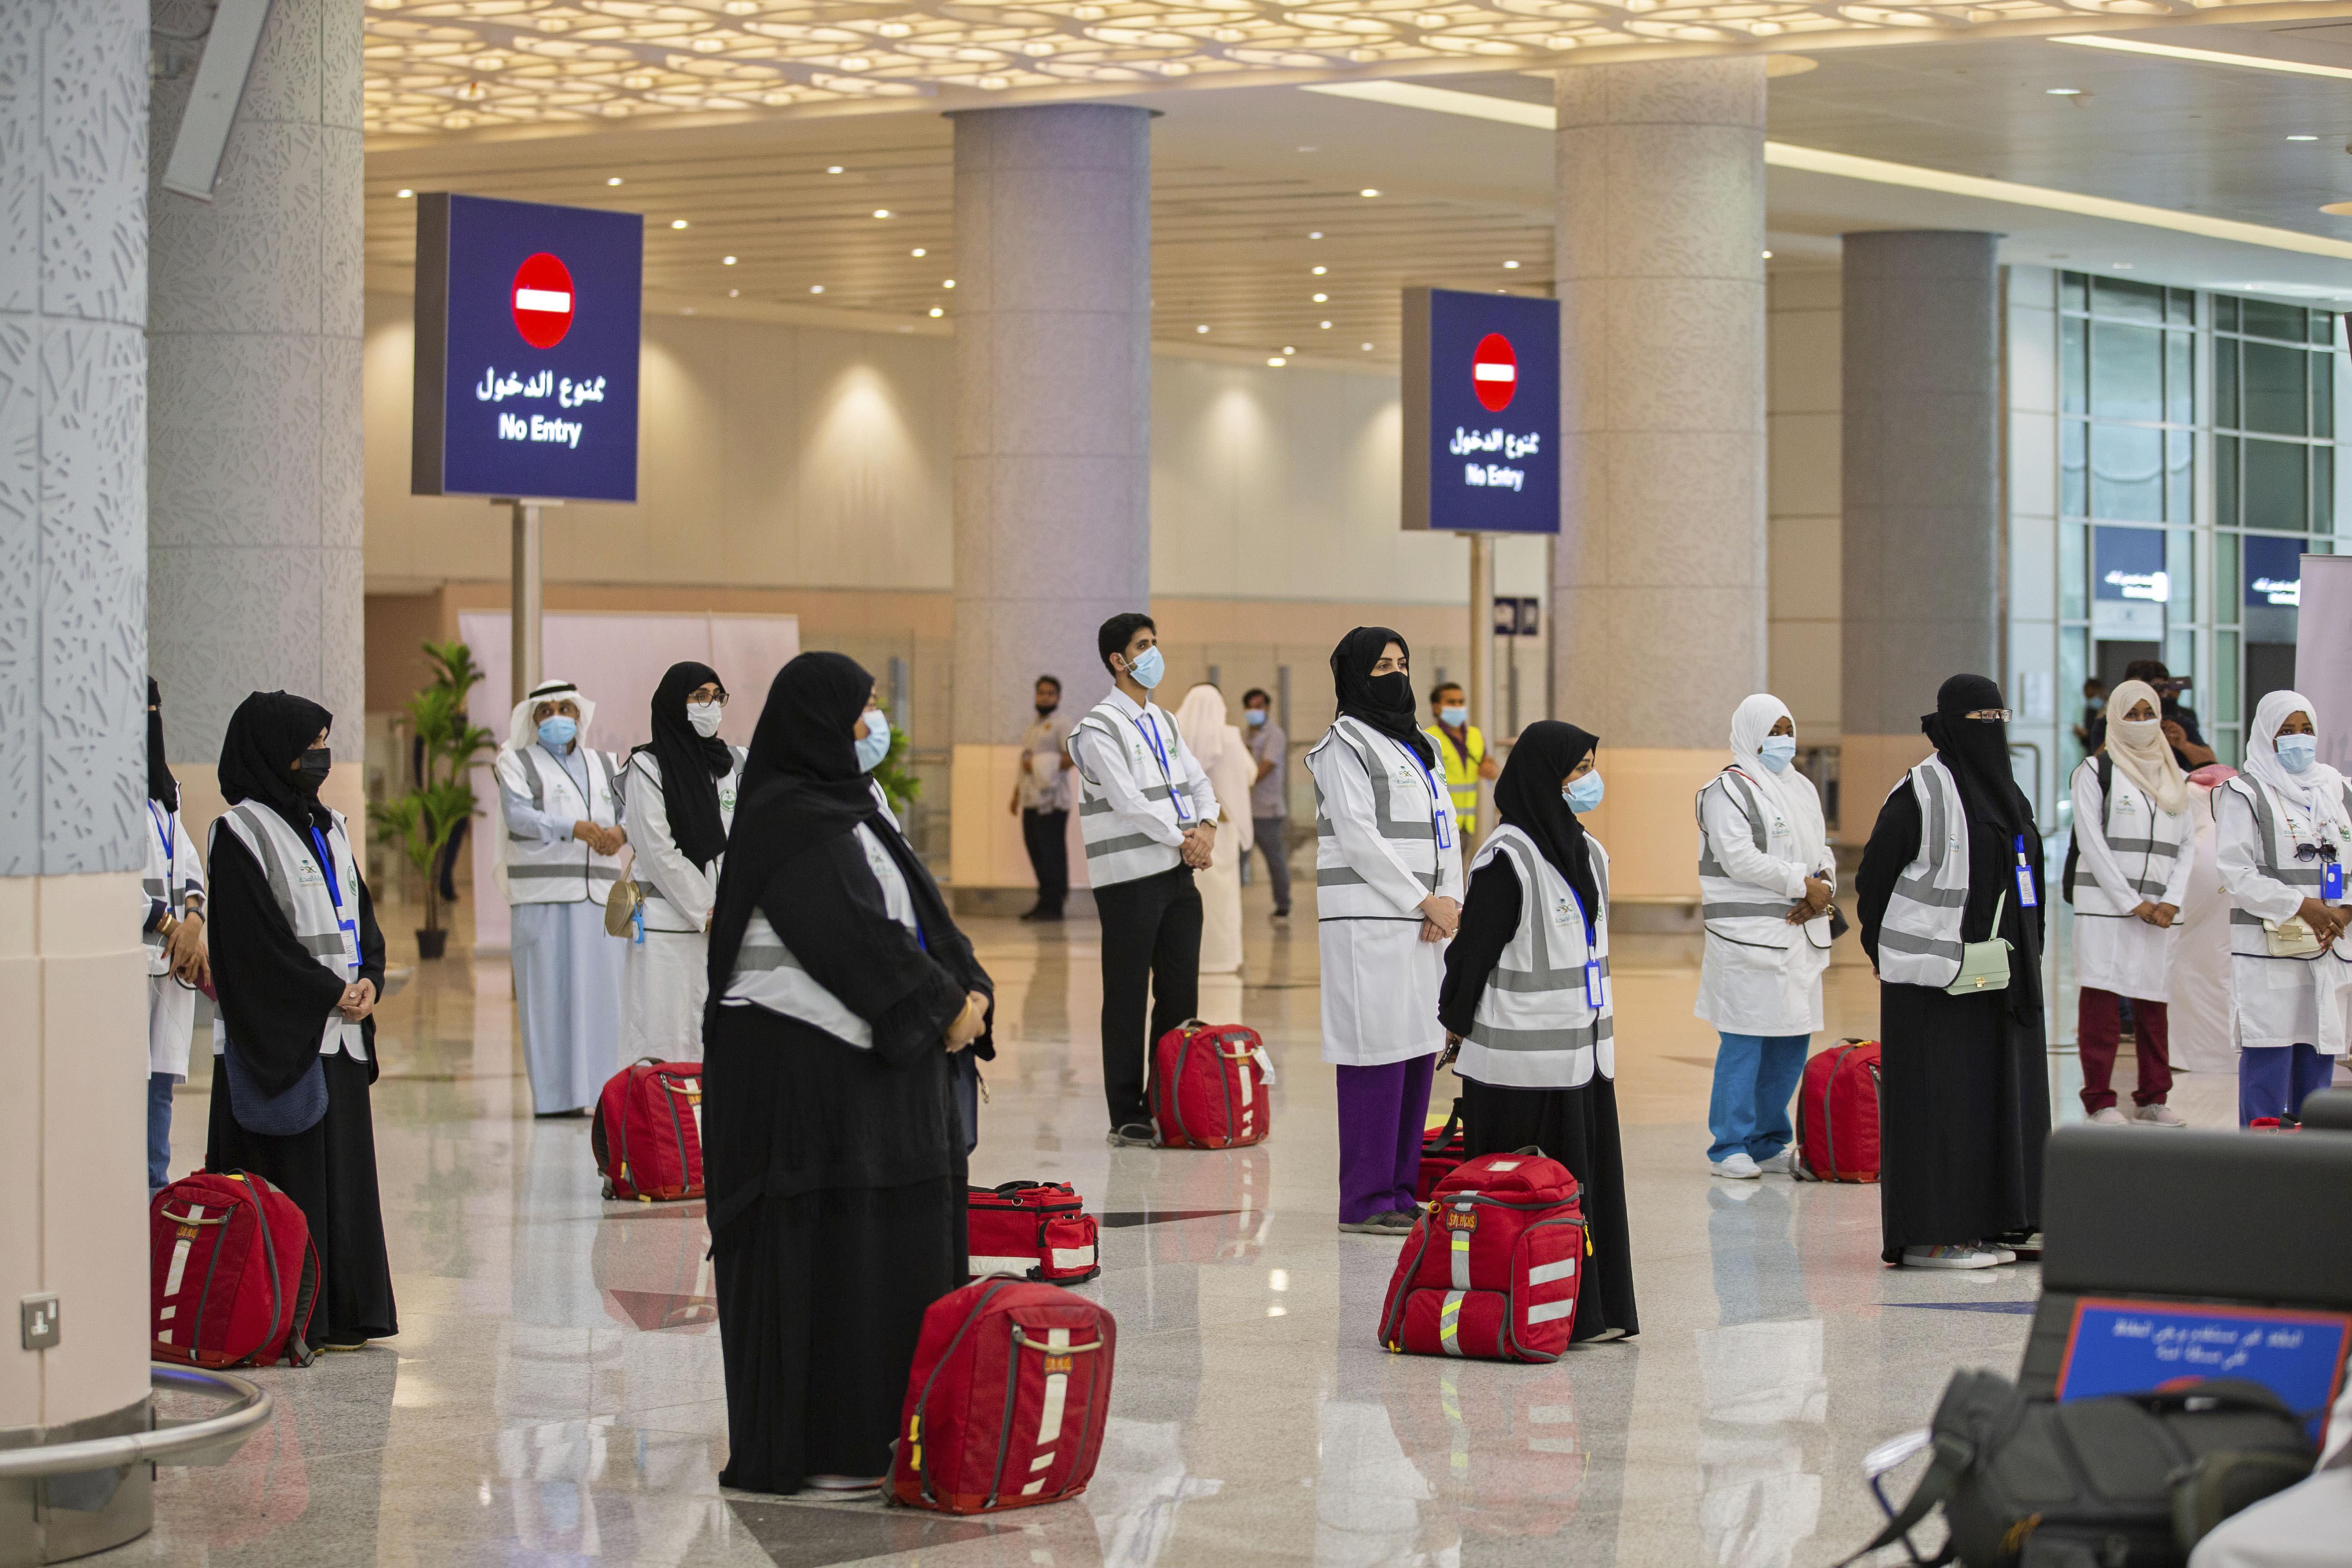 Scaled-back Hajj pilgrimage due to start in Saudi Arabia